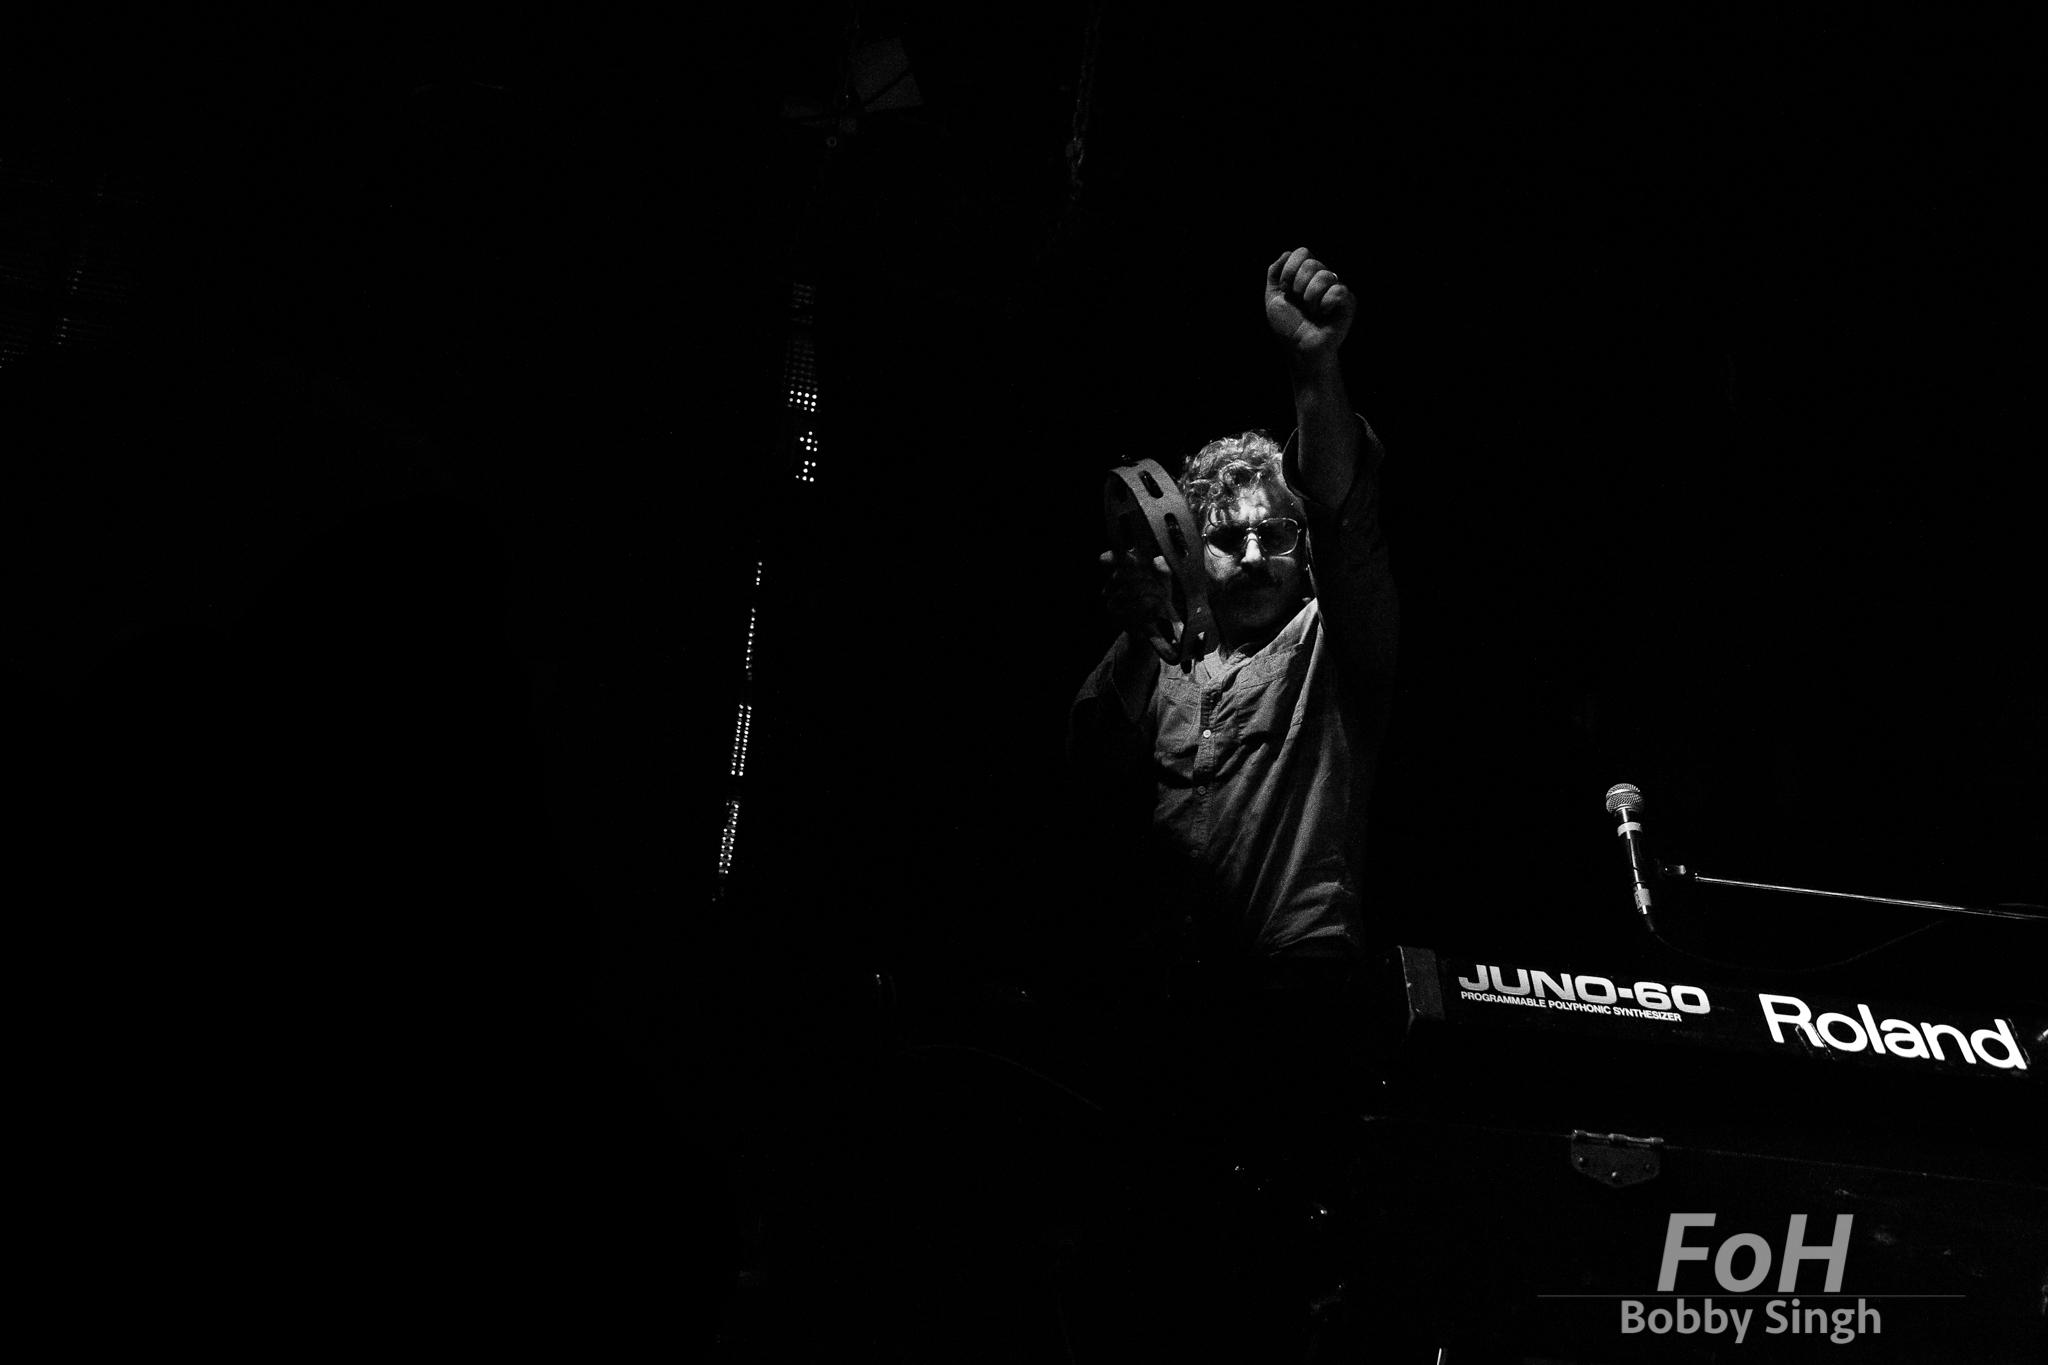 Zeus - This Ain't Hollywood, Hamilton. Photo by Bobby Singh/ @fohphoto